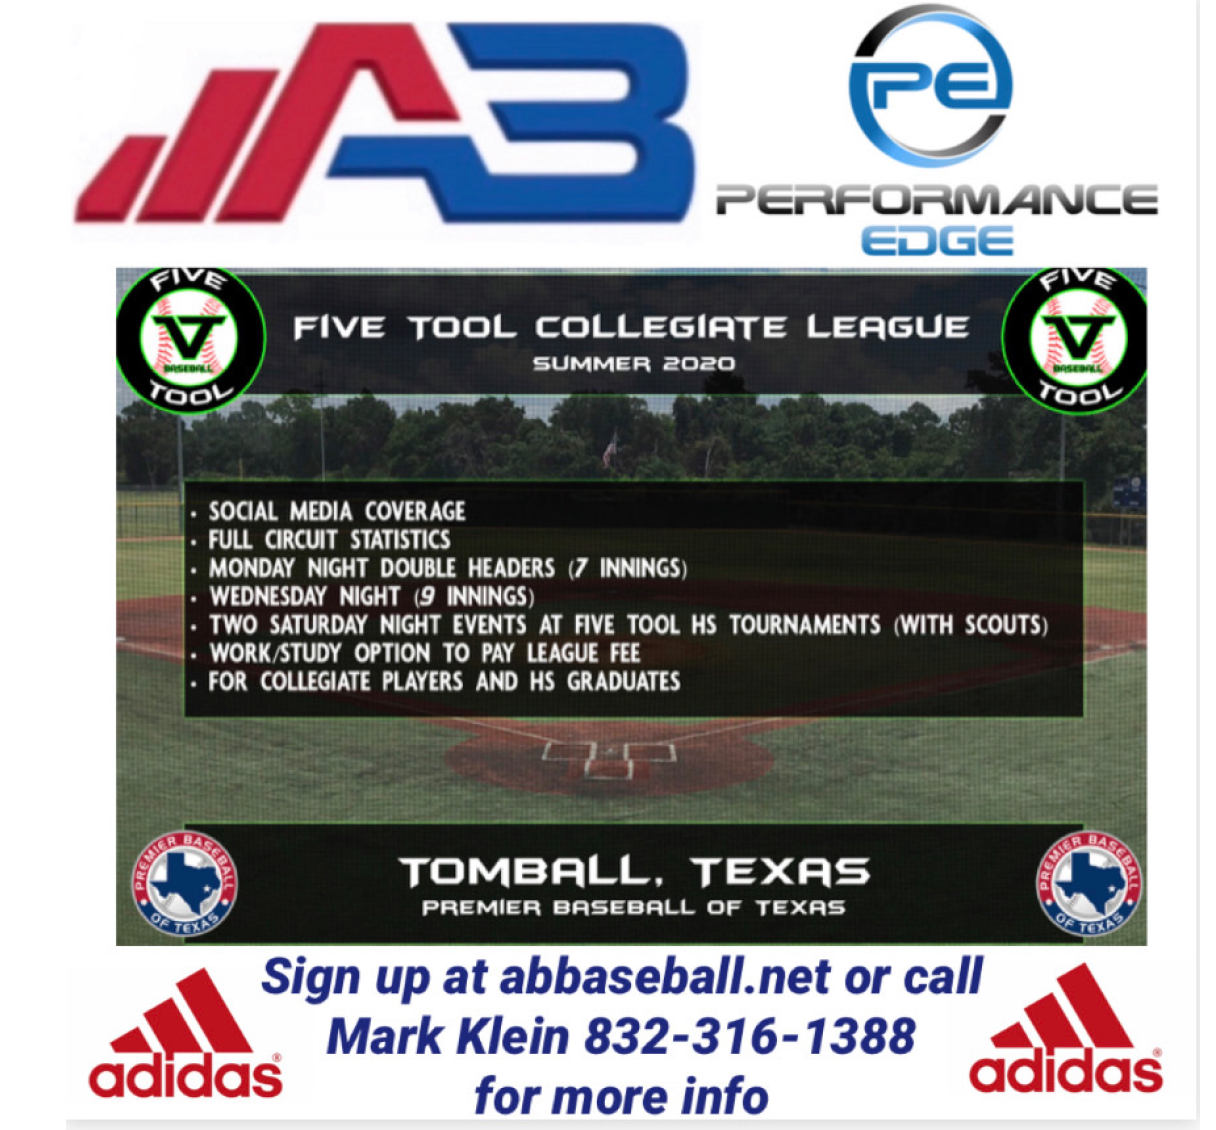 AB baseball / Performance Edge ---Five Tool Collegiate League ---Player Fee